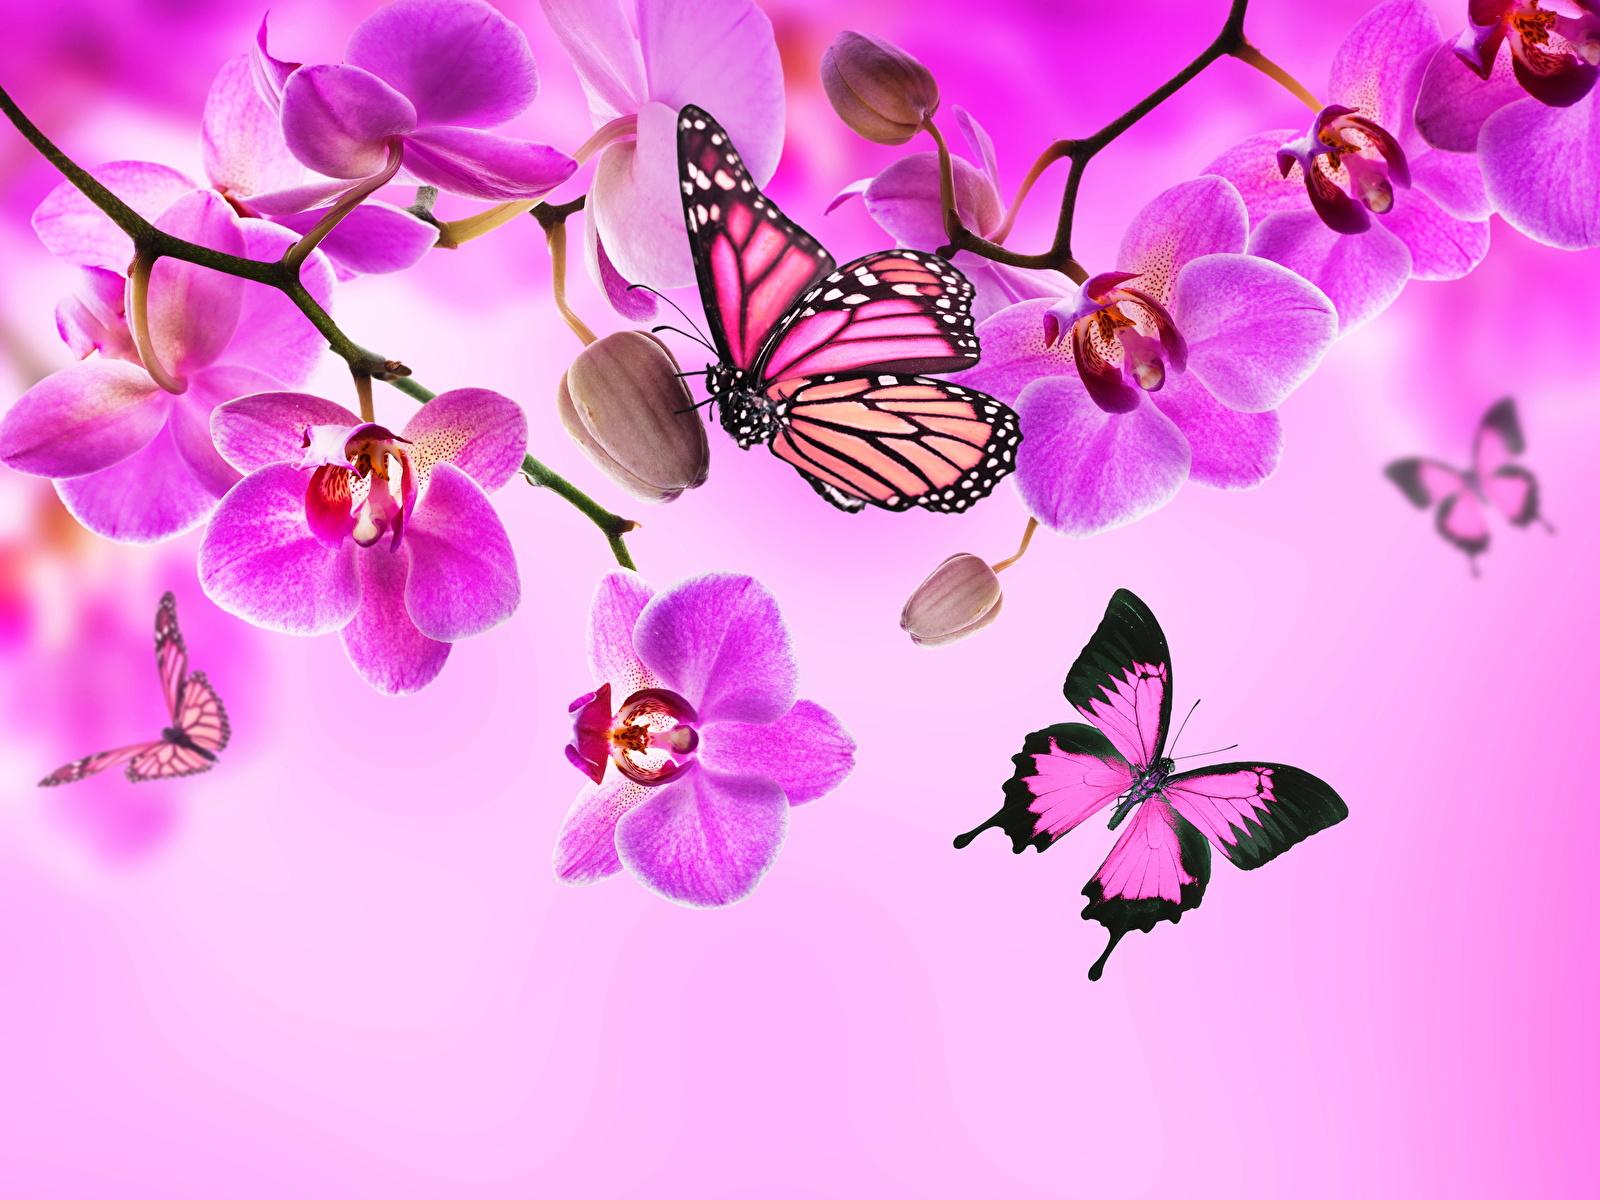 Фотография Данаида монарх Бабочки Орхидеи Розовый Цветы 1600x1200